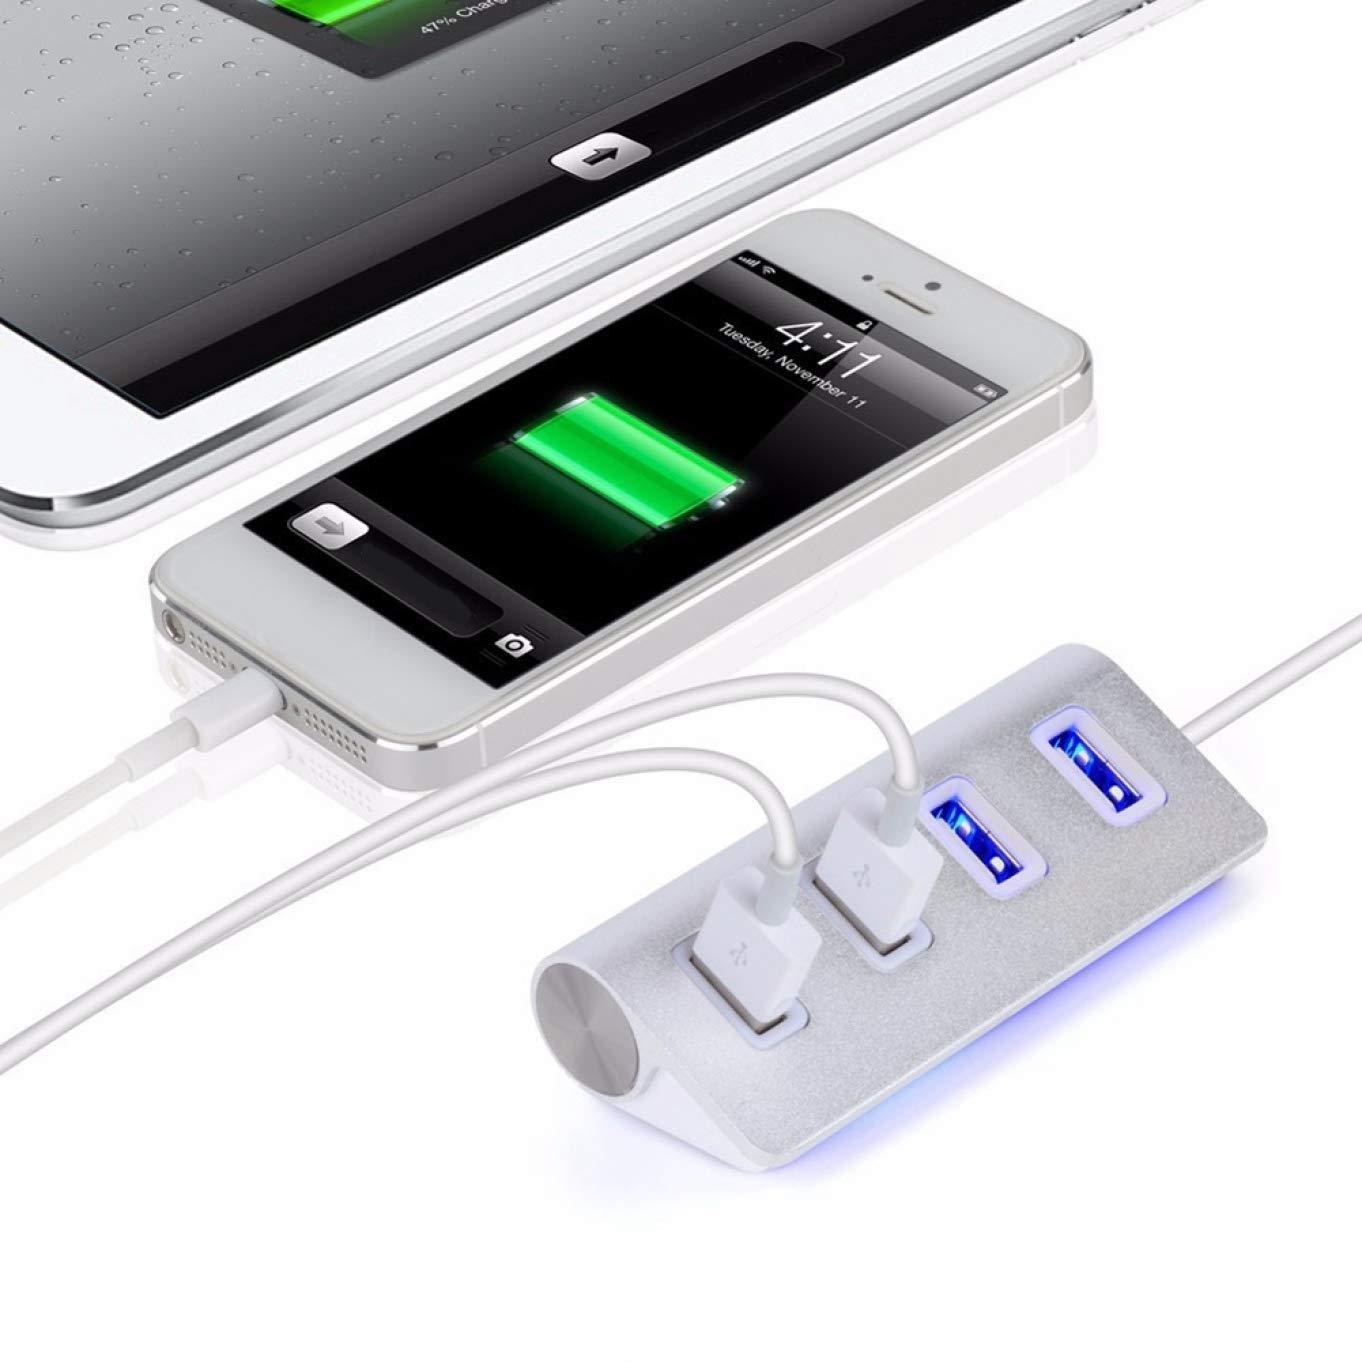 Lanso Nice Adaptador Divisor de 4 Puertos USB 2.0 de Aluminio de Alta Velocidad para PC Lot TF